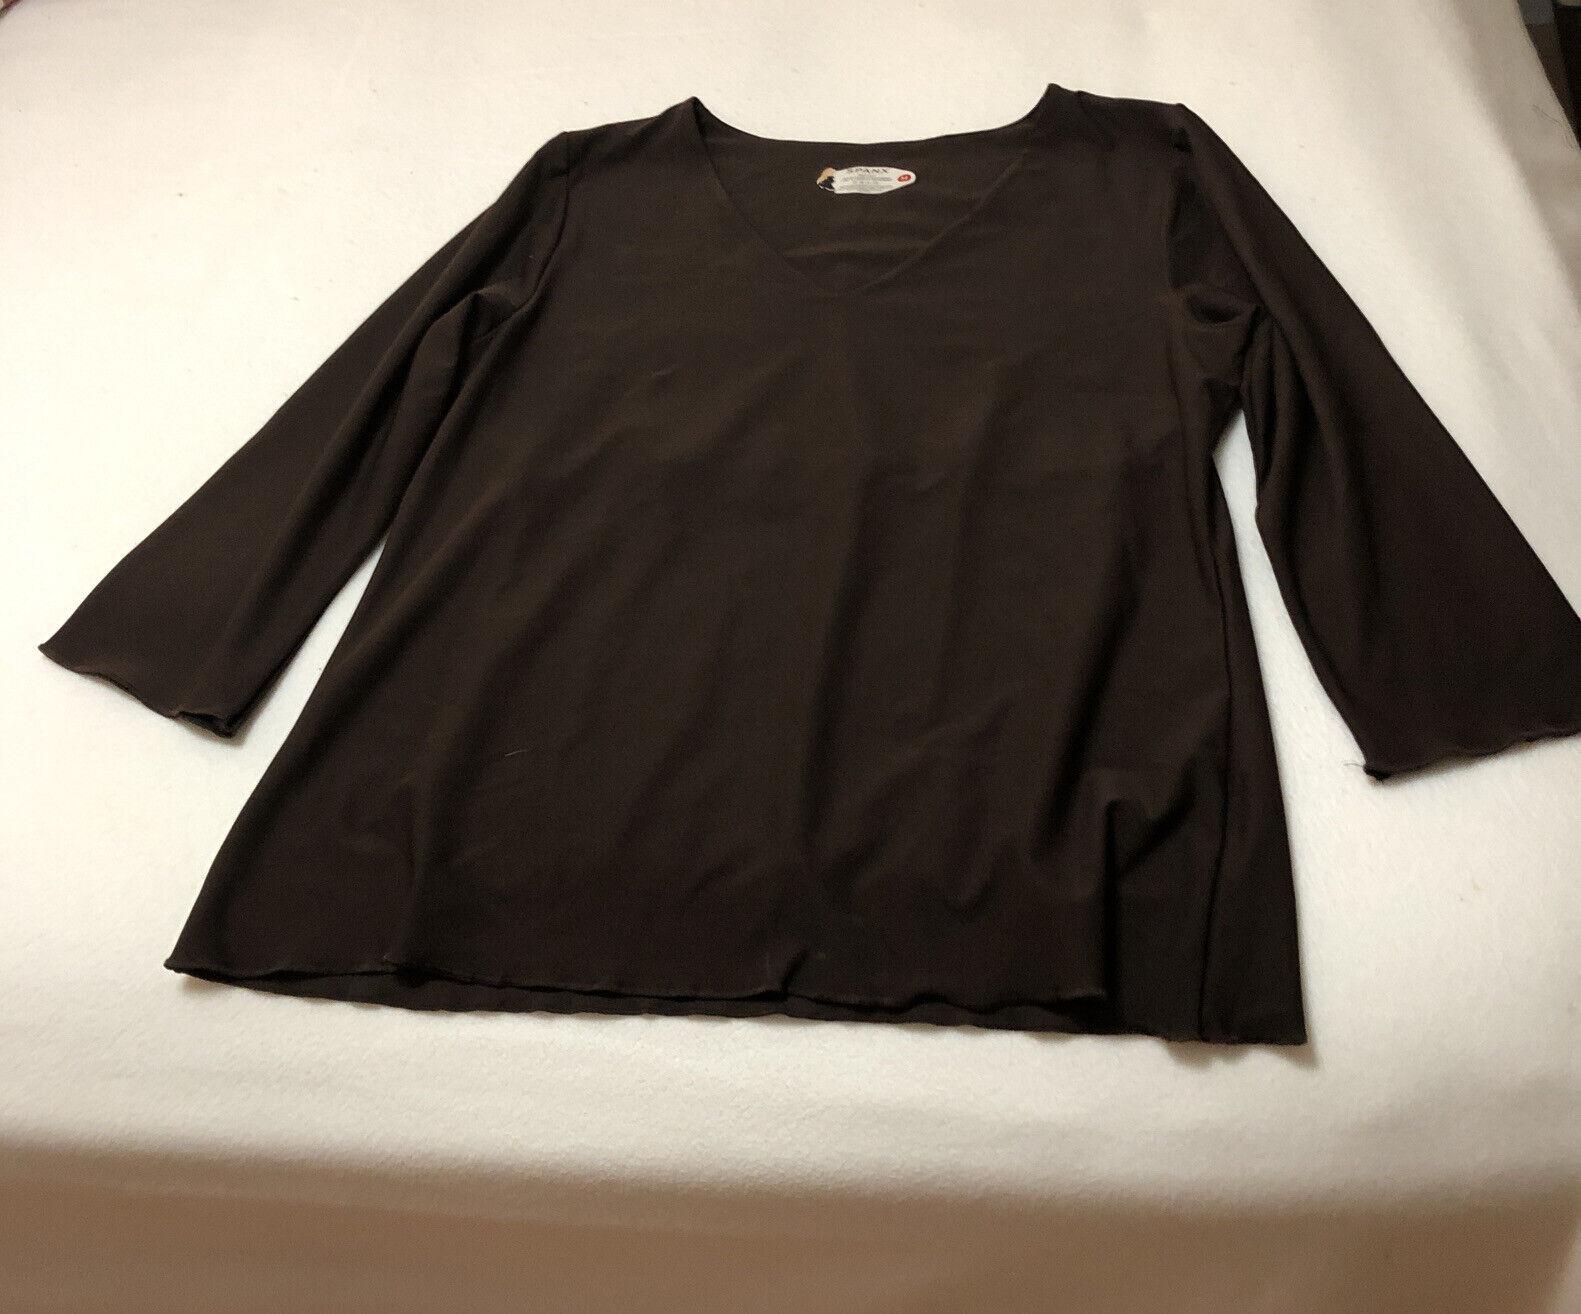 SPANX By Sara Blakey SZ M Brown 3/4 Sleeve Lined Shape Wear Top RN 112121 NEW